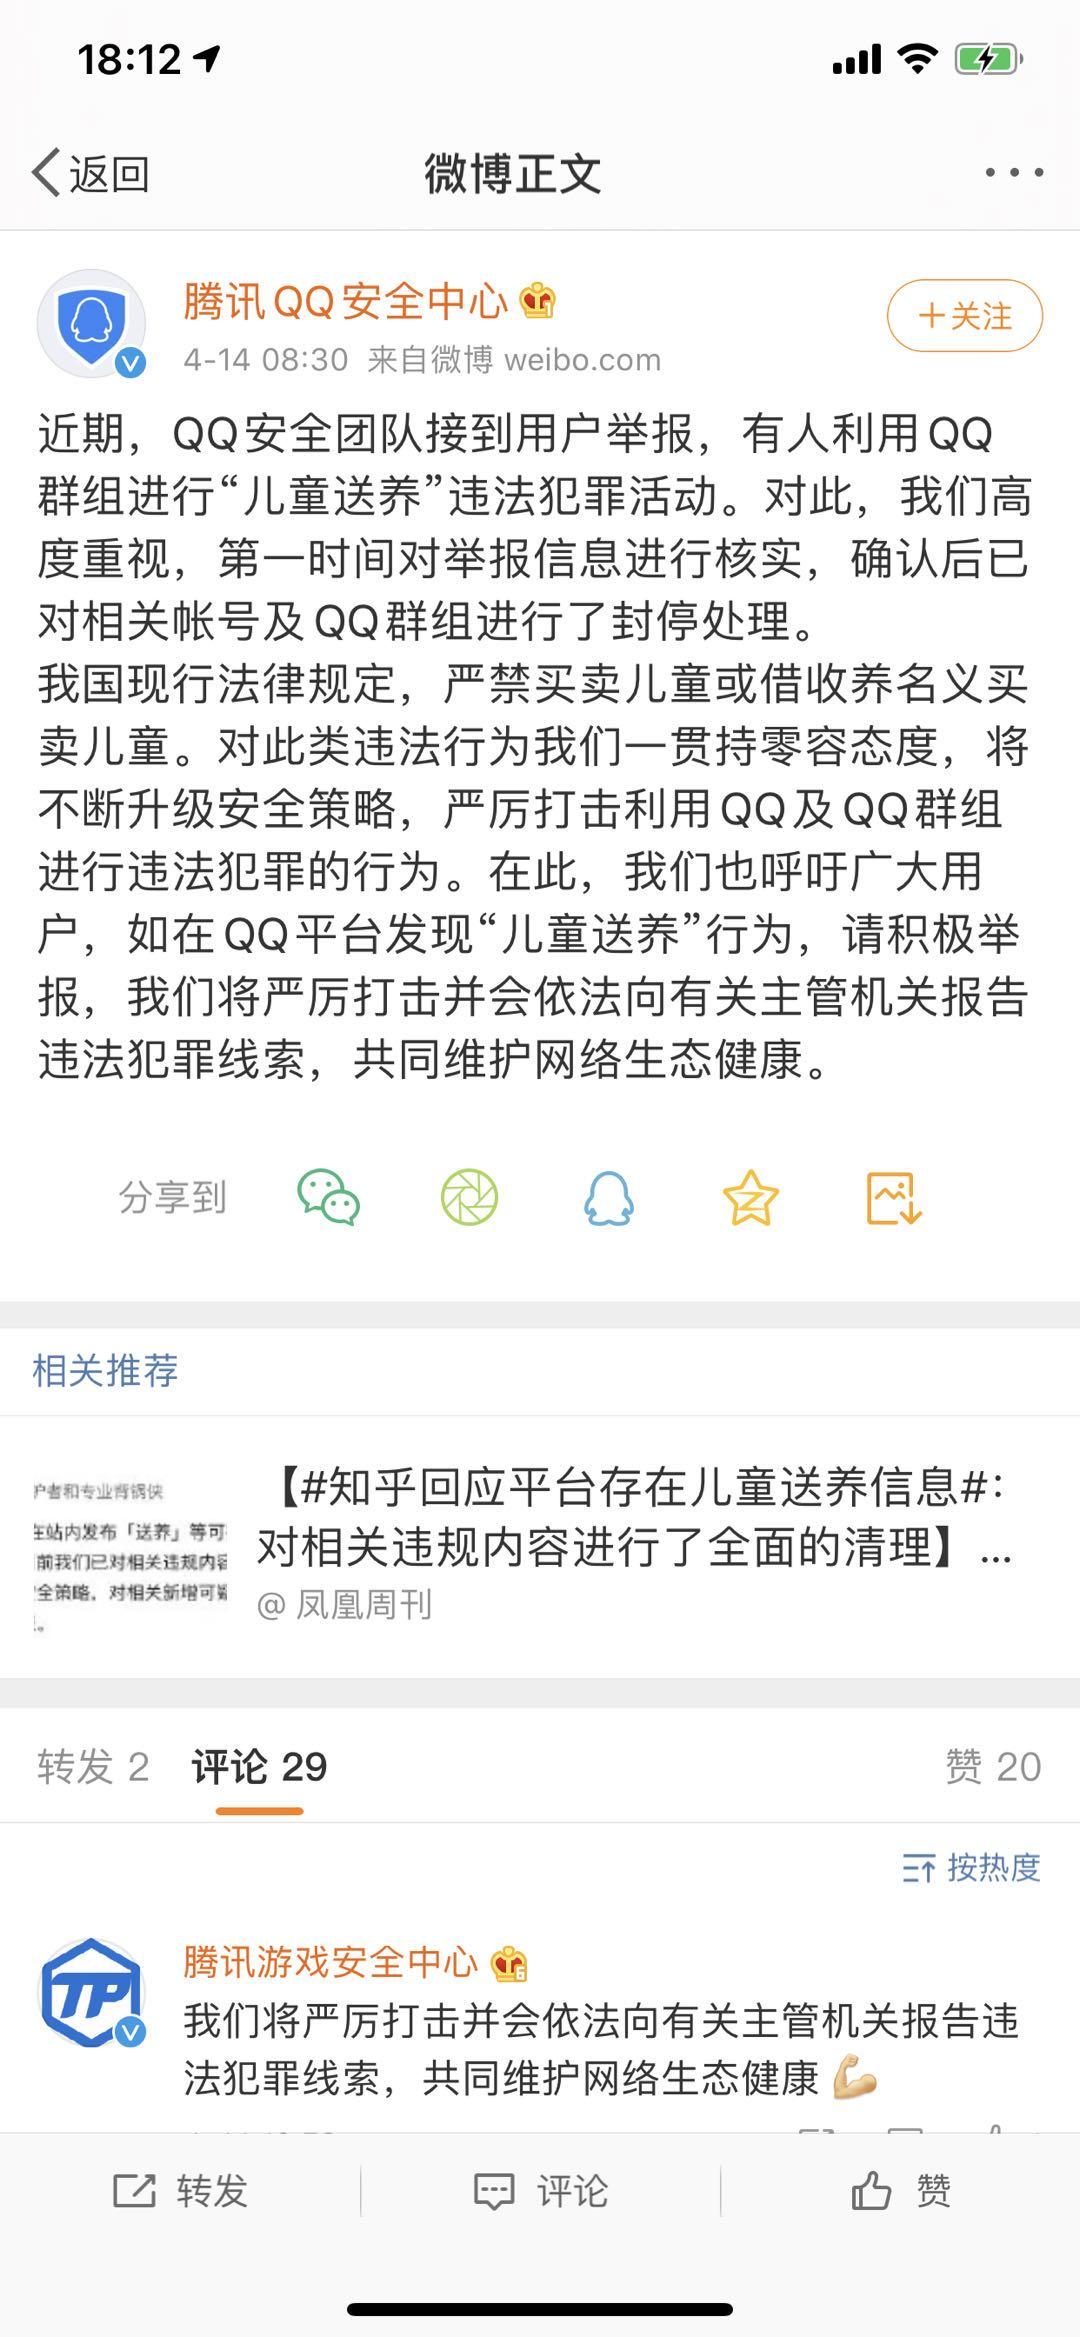 QQ安全中心:已封停进行